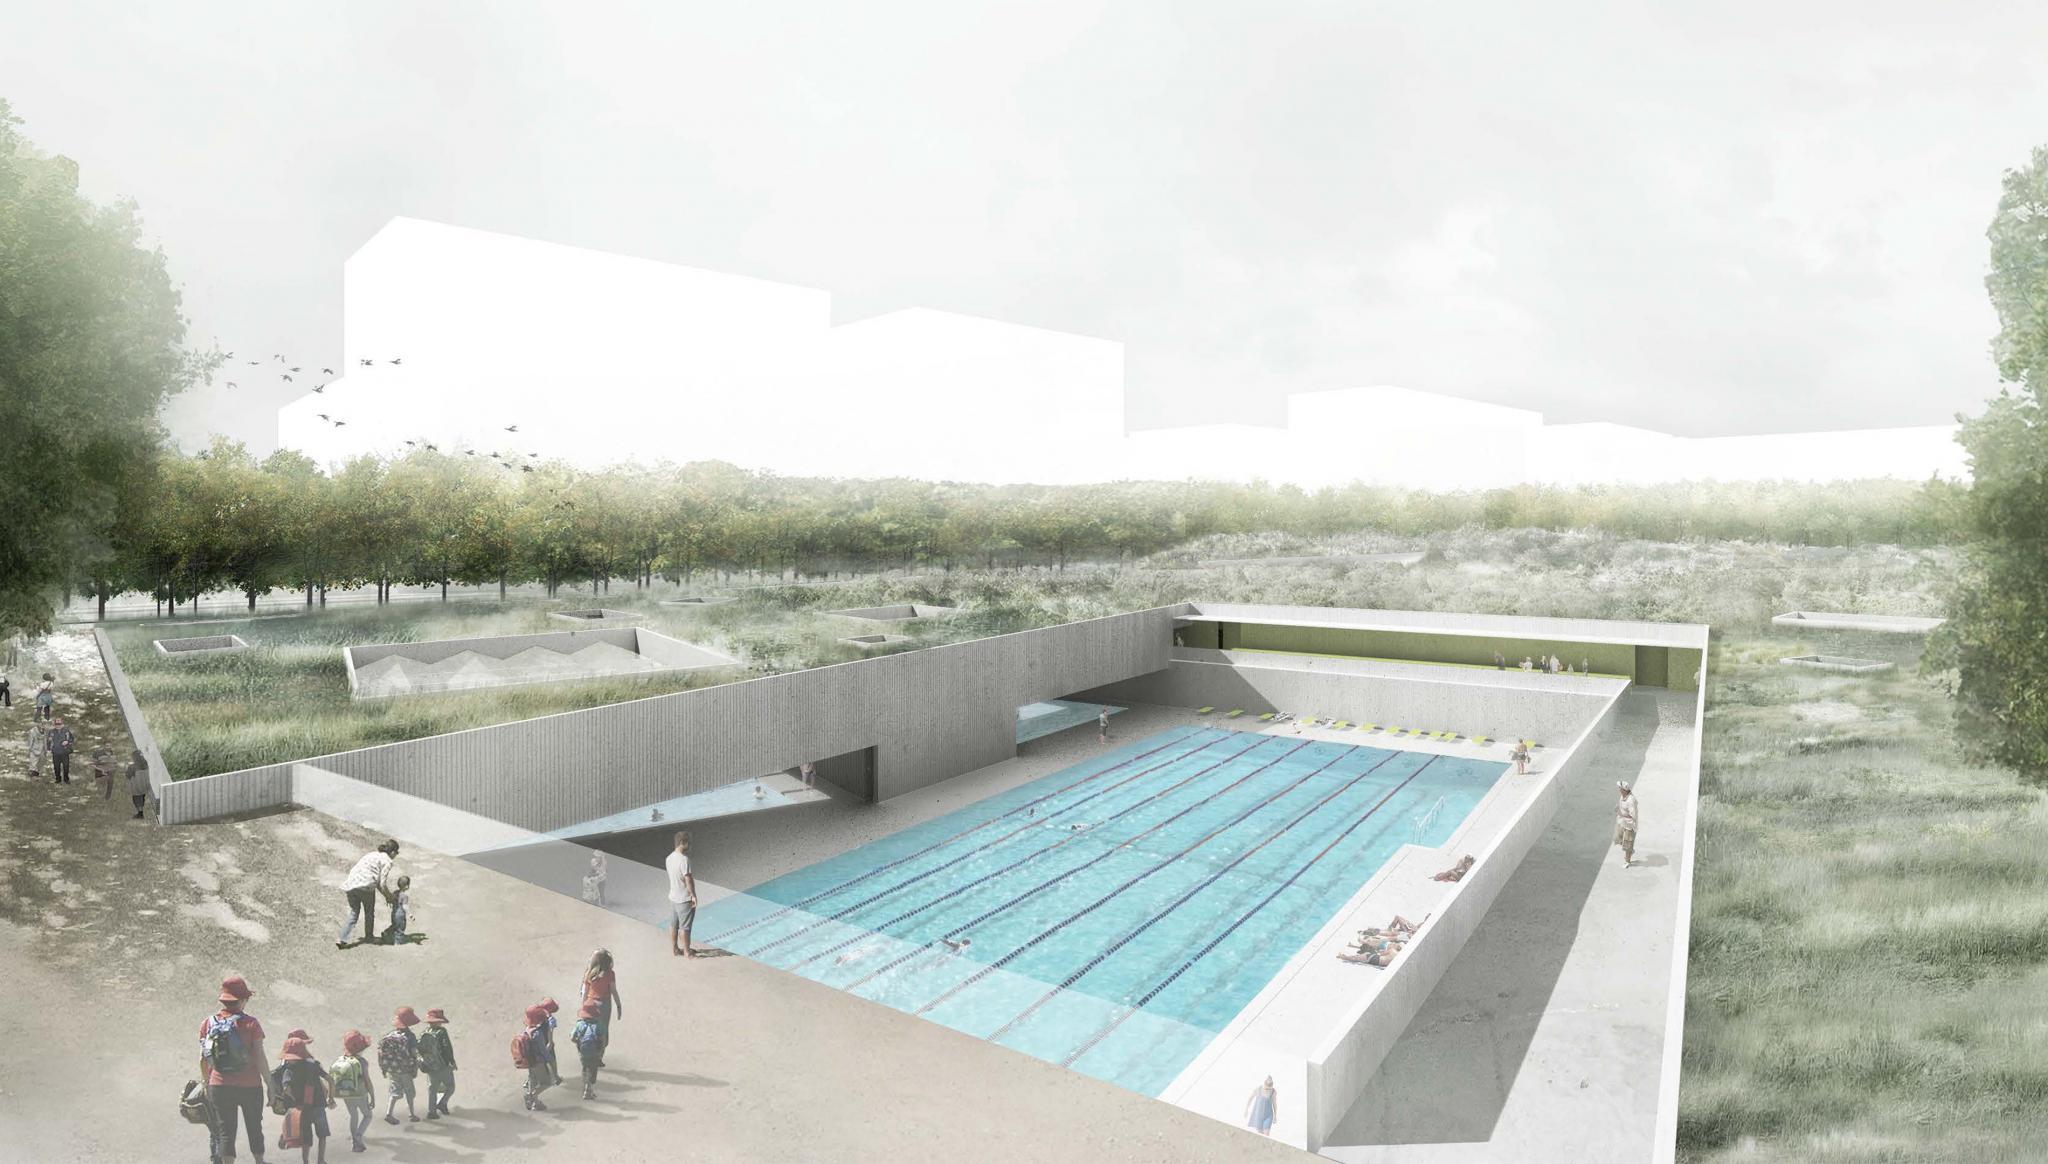 Gunyama Park Aquatic Centre